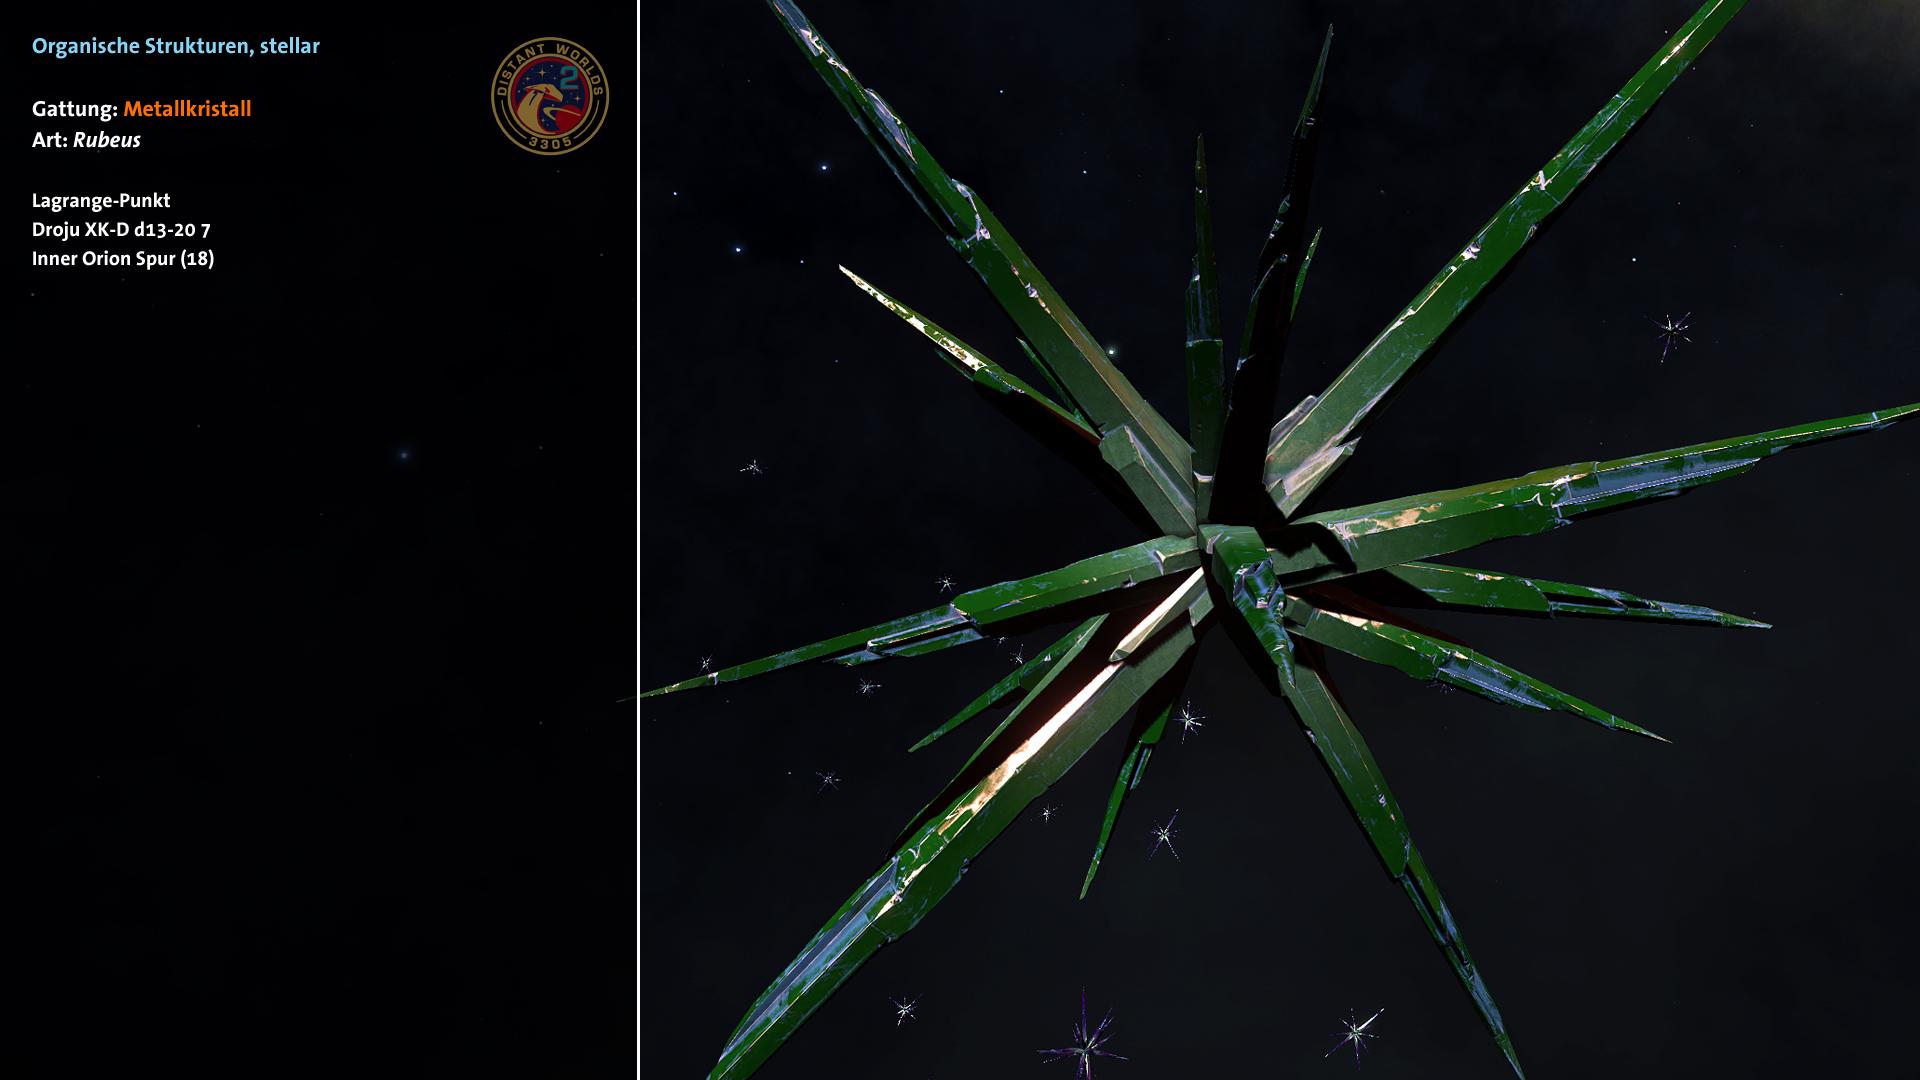 dw2-01-015-biostellar.jpg